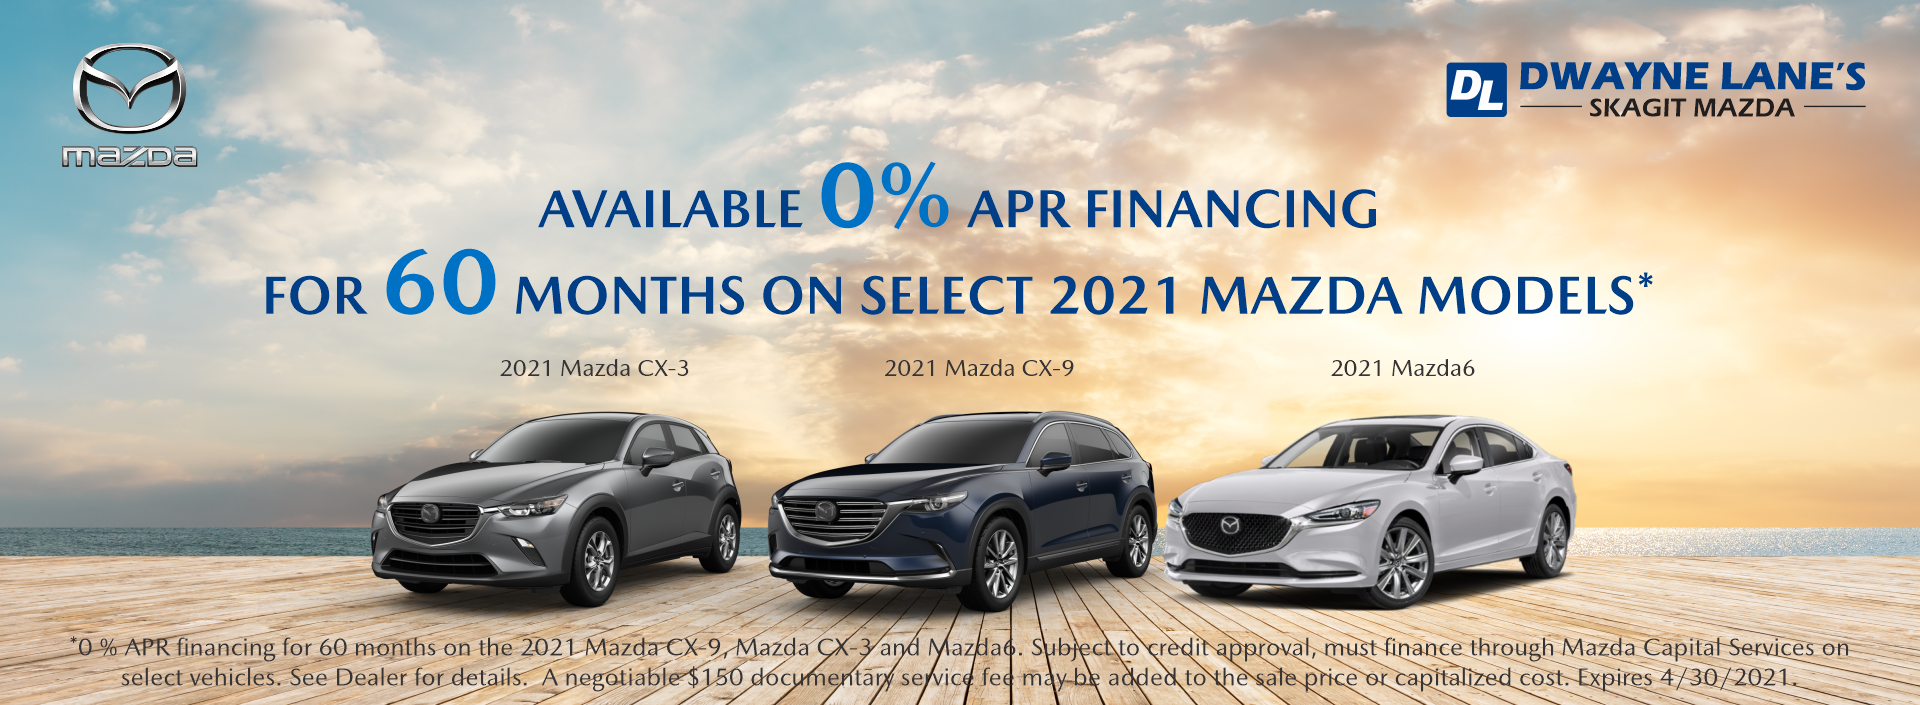 2021AprilBanners-DLAF-Mazda